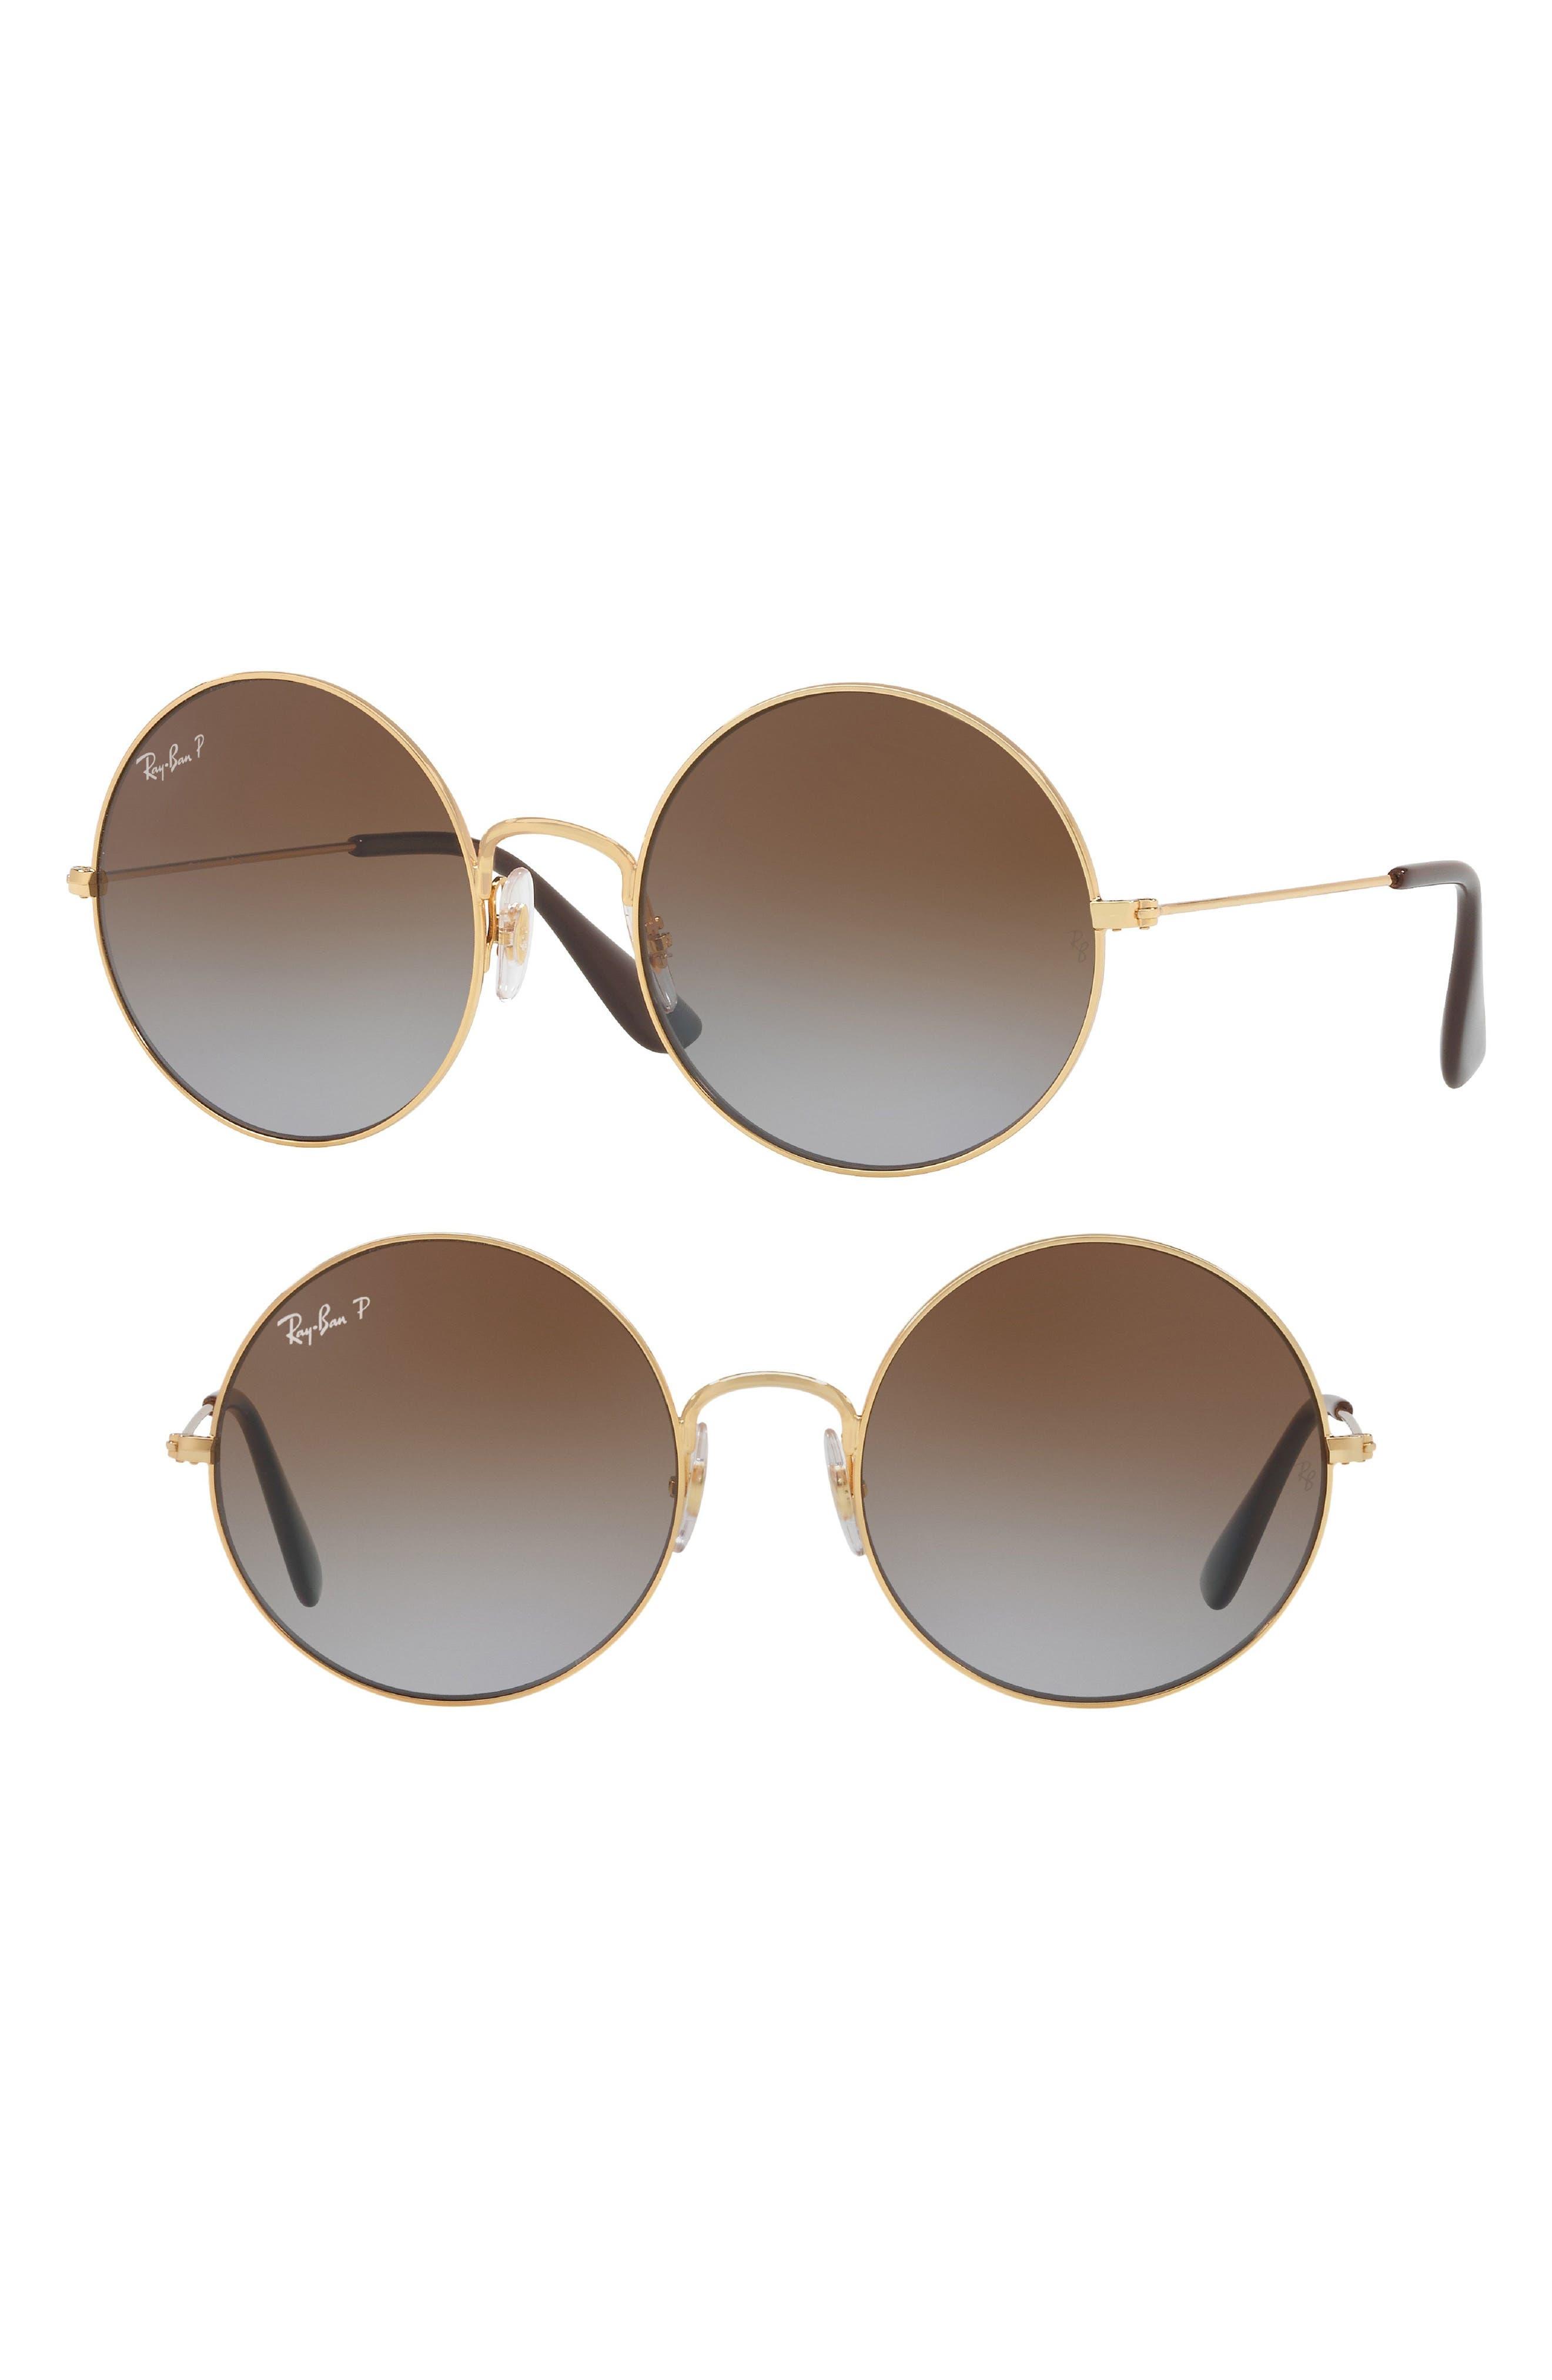 Ja-Jo 50mm Round Polarized Sunglasses,                             Main thumbnail 1, color,                             710